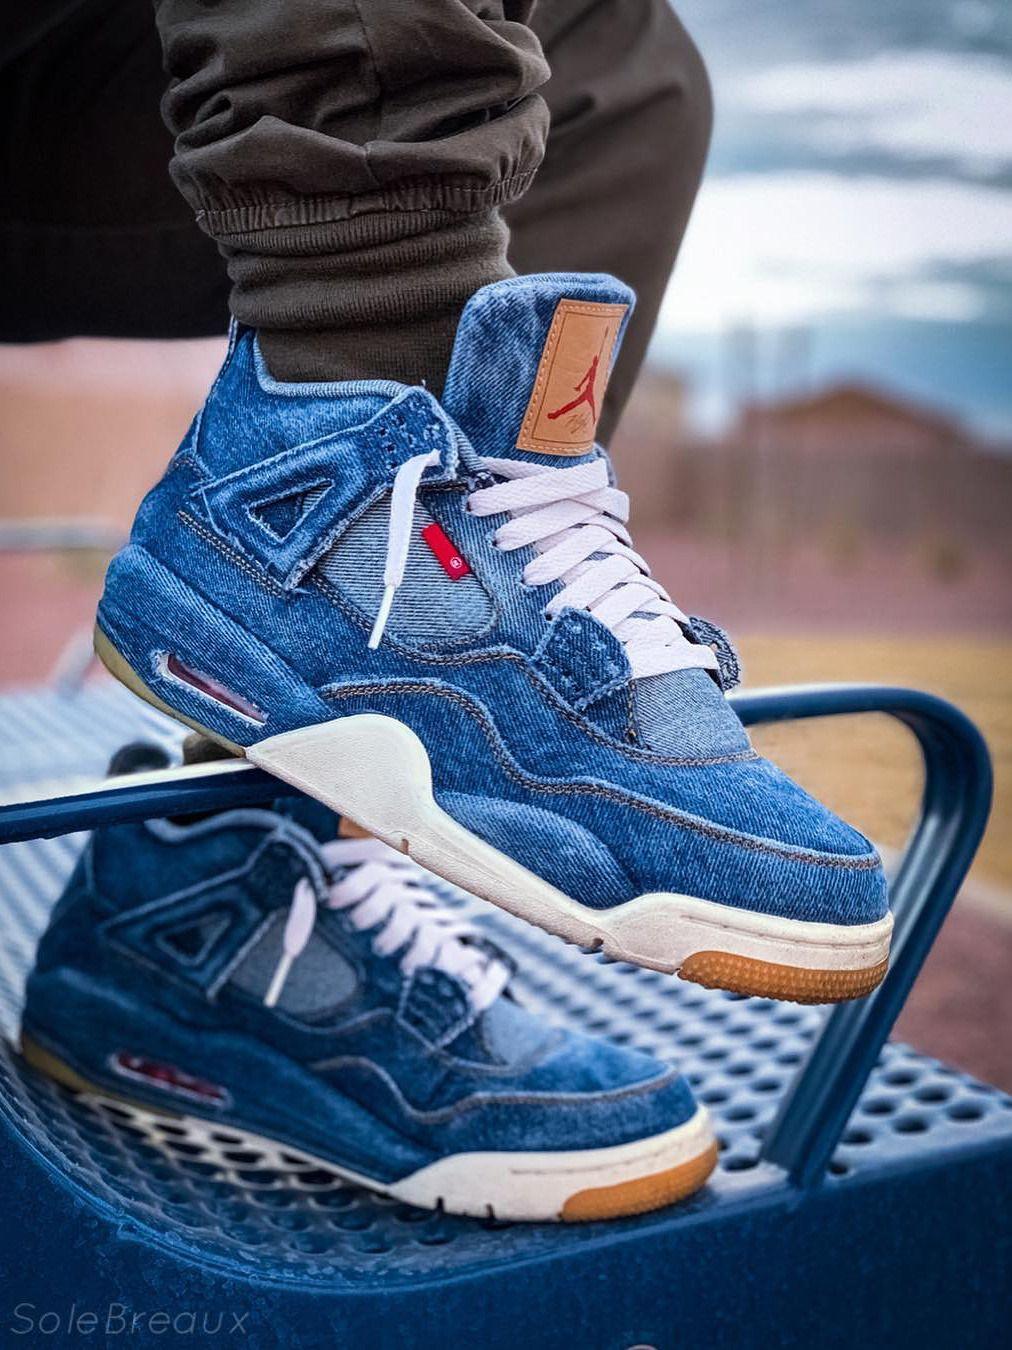 Año Montaña Kilauea Dictadura  Levis x Nike Air Jordan 4 Retro - 2018 (by solebreaux) | Black nike shoes,  Jordan shoes retro, Mens nike shoes